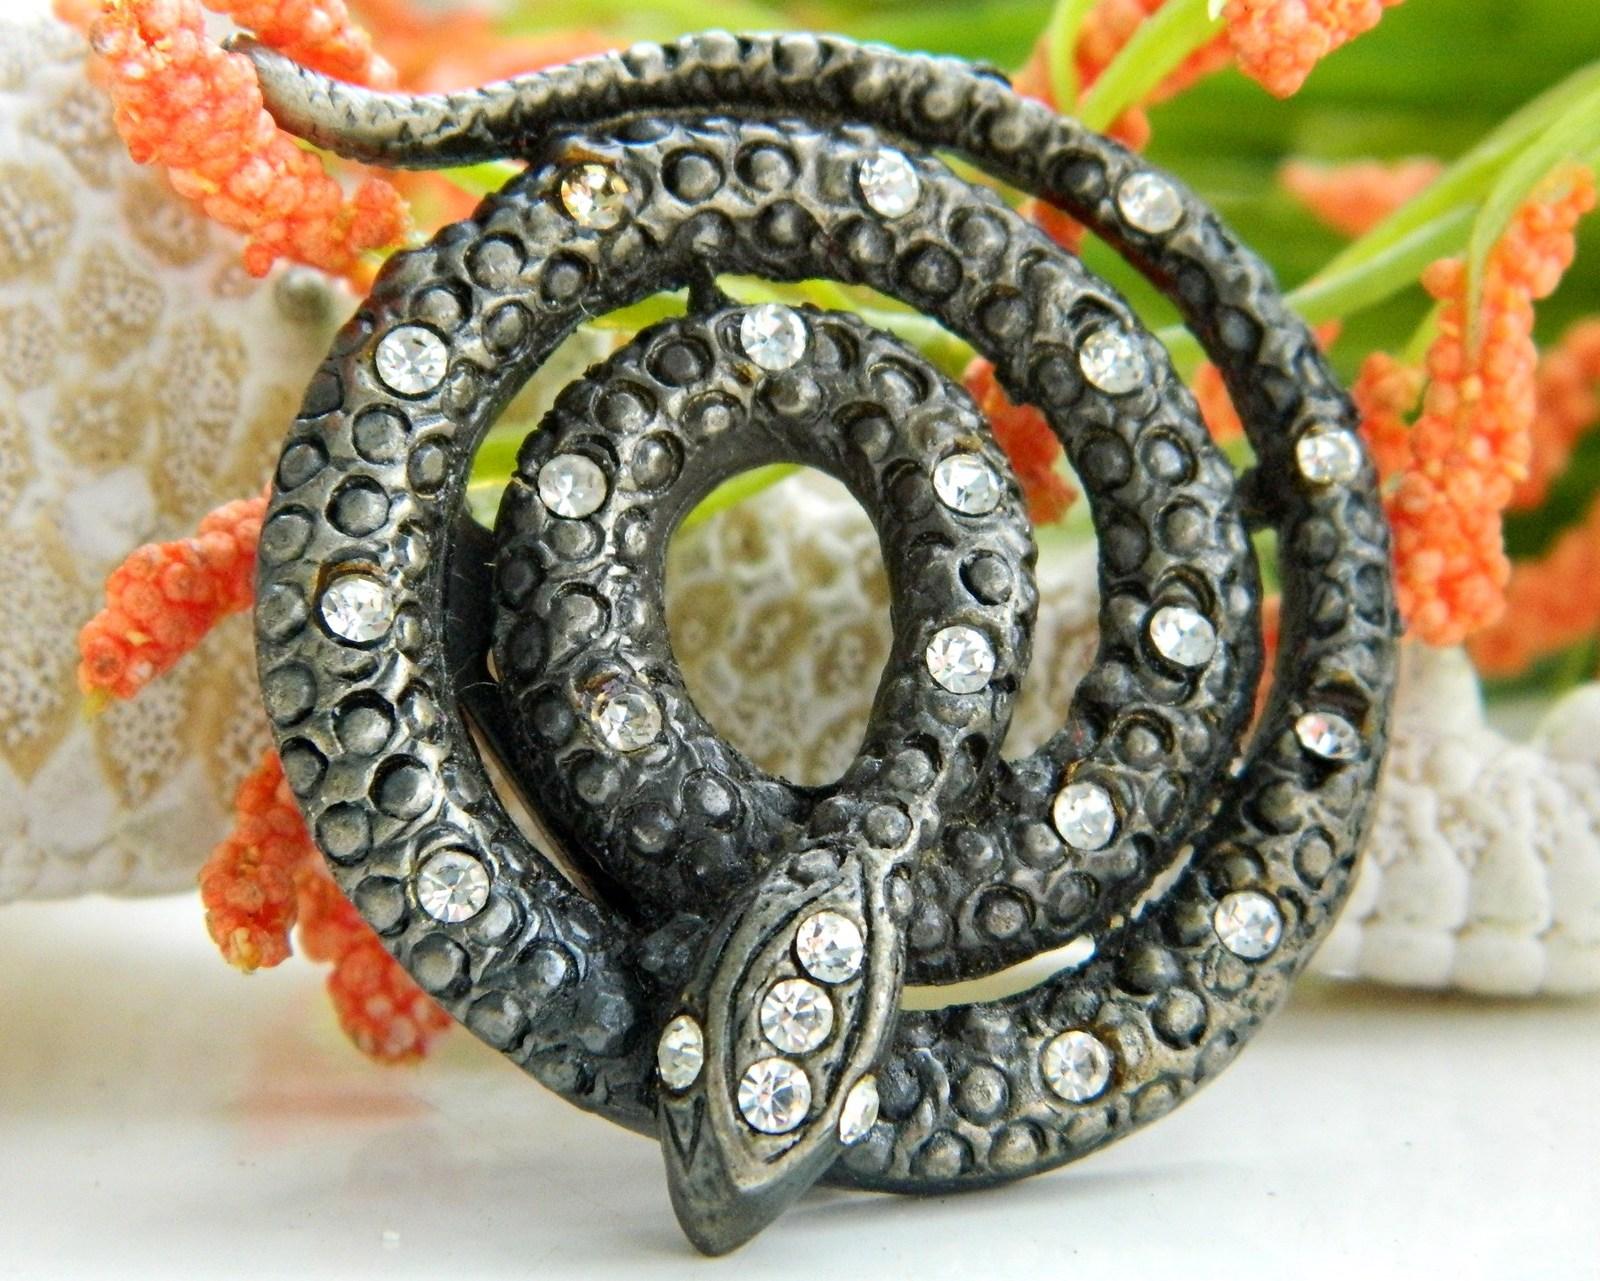 Vintage Coiled Snake Brooch Pin Black Figural Rattlesnake Rhinestones